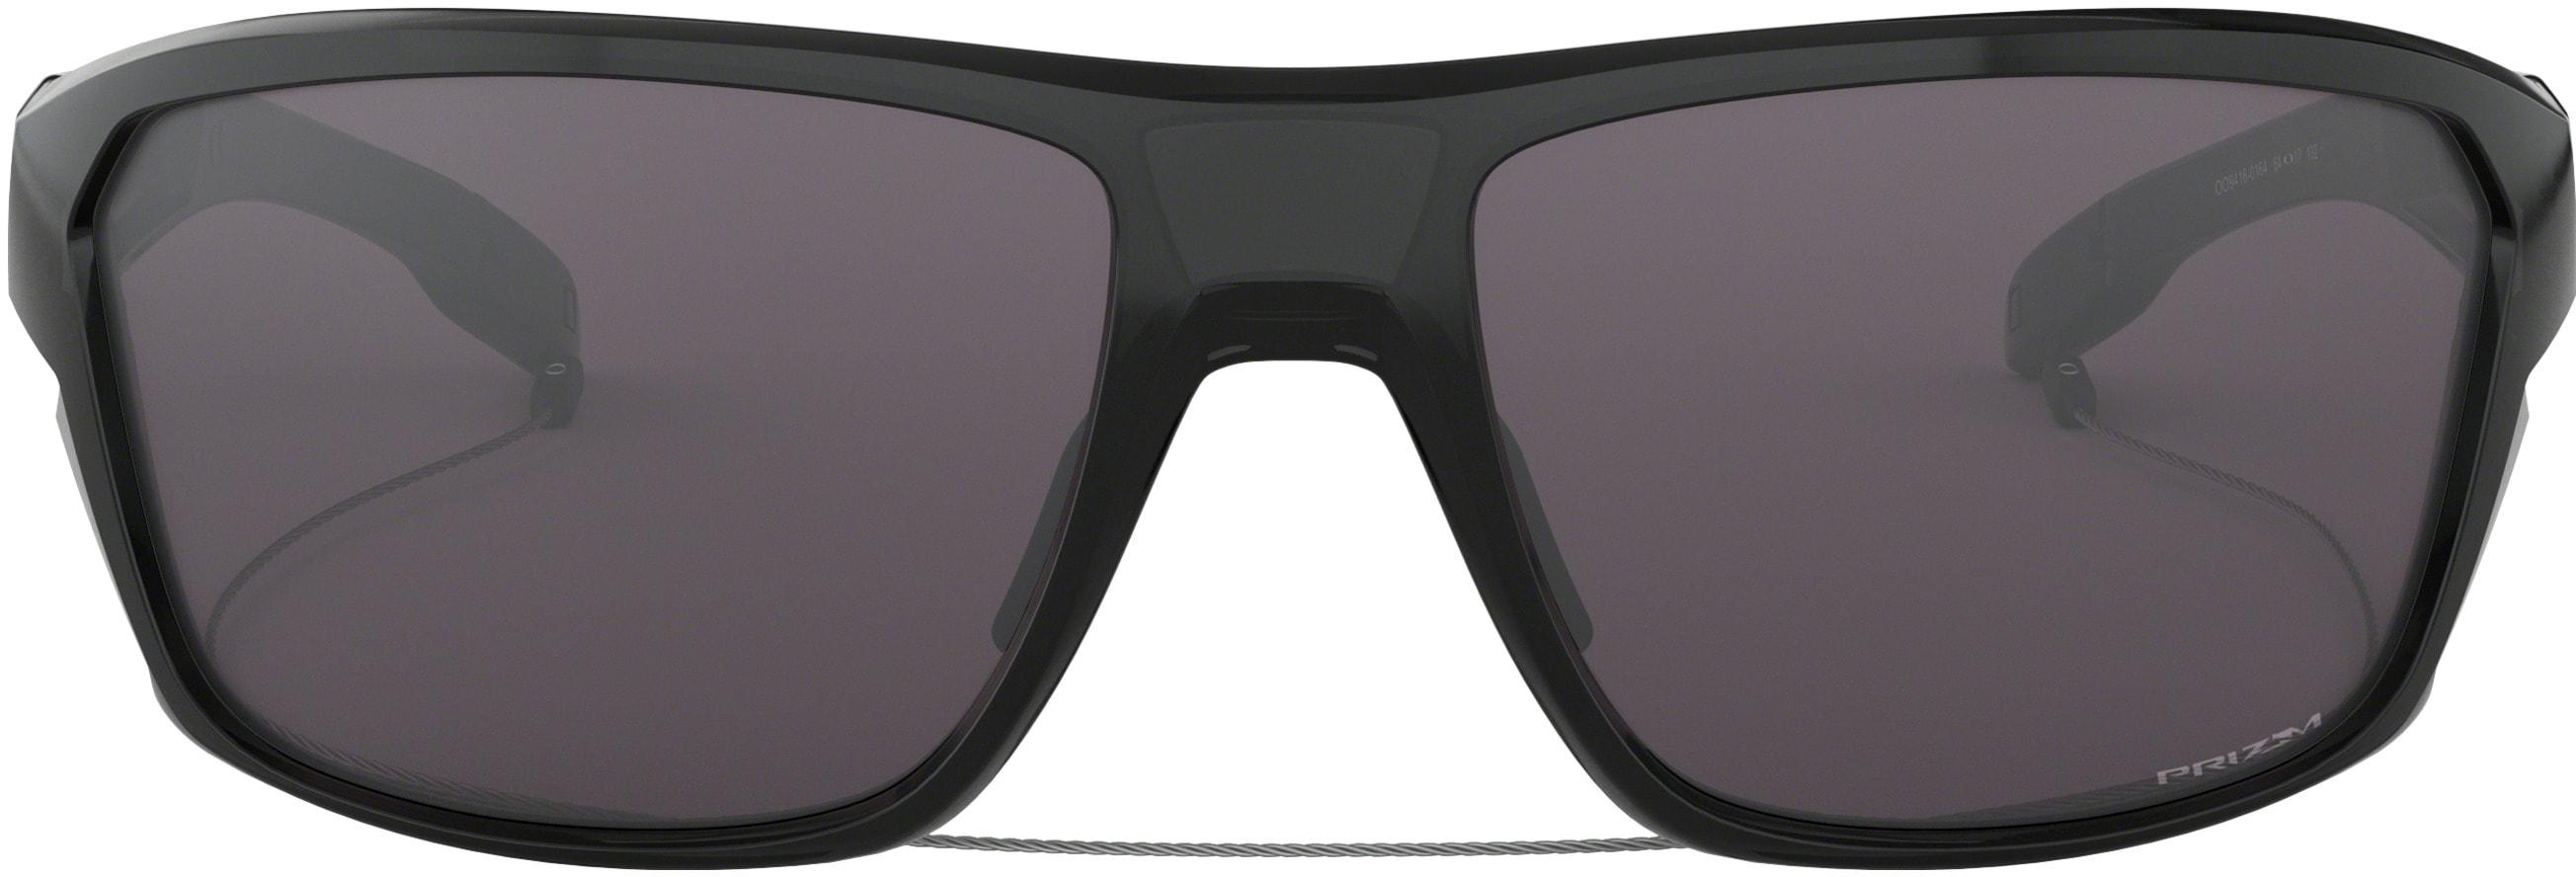 oakley sunglasses for bike riding